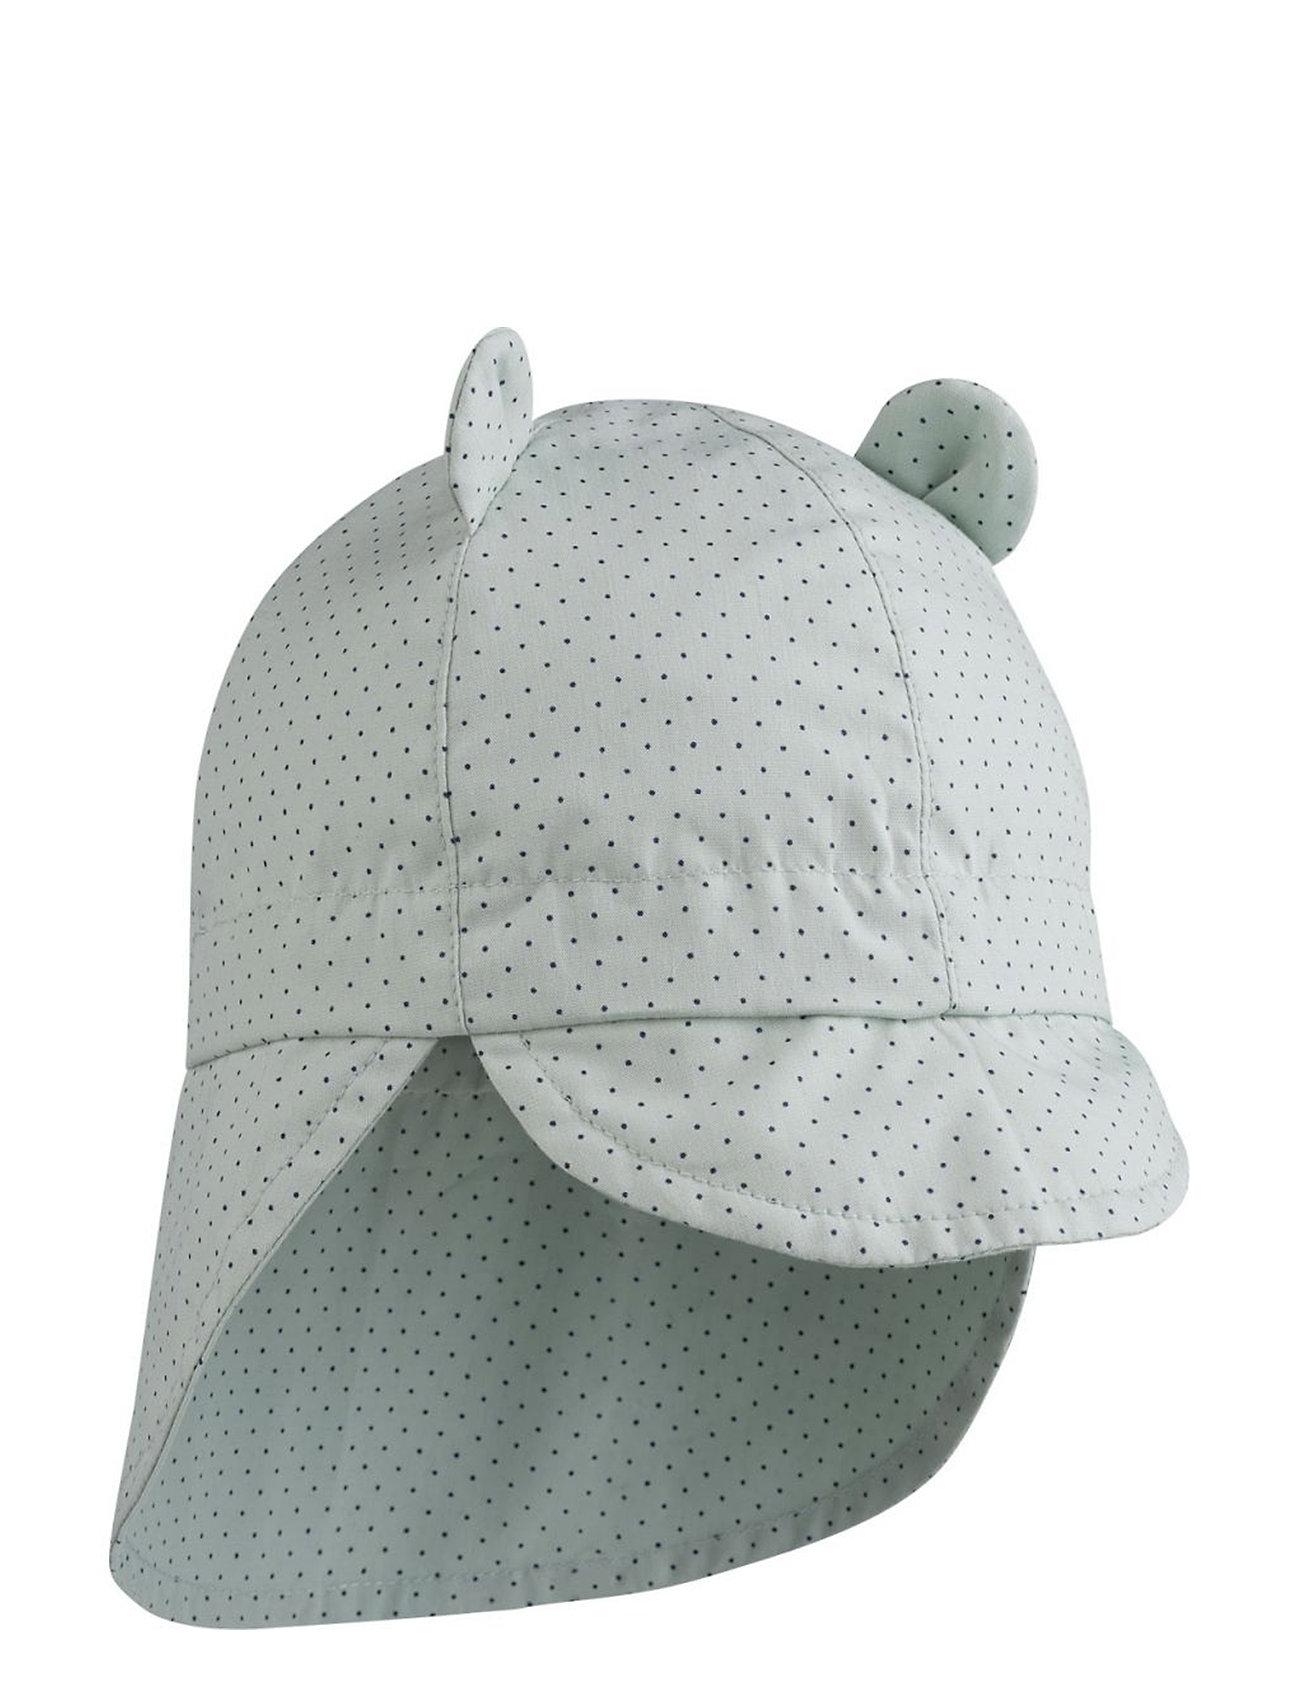 Liewood Gorm sun hat - LITTLE DOT DUSTY MINT